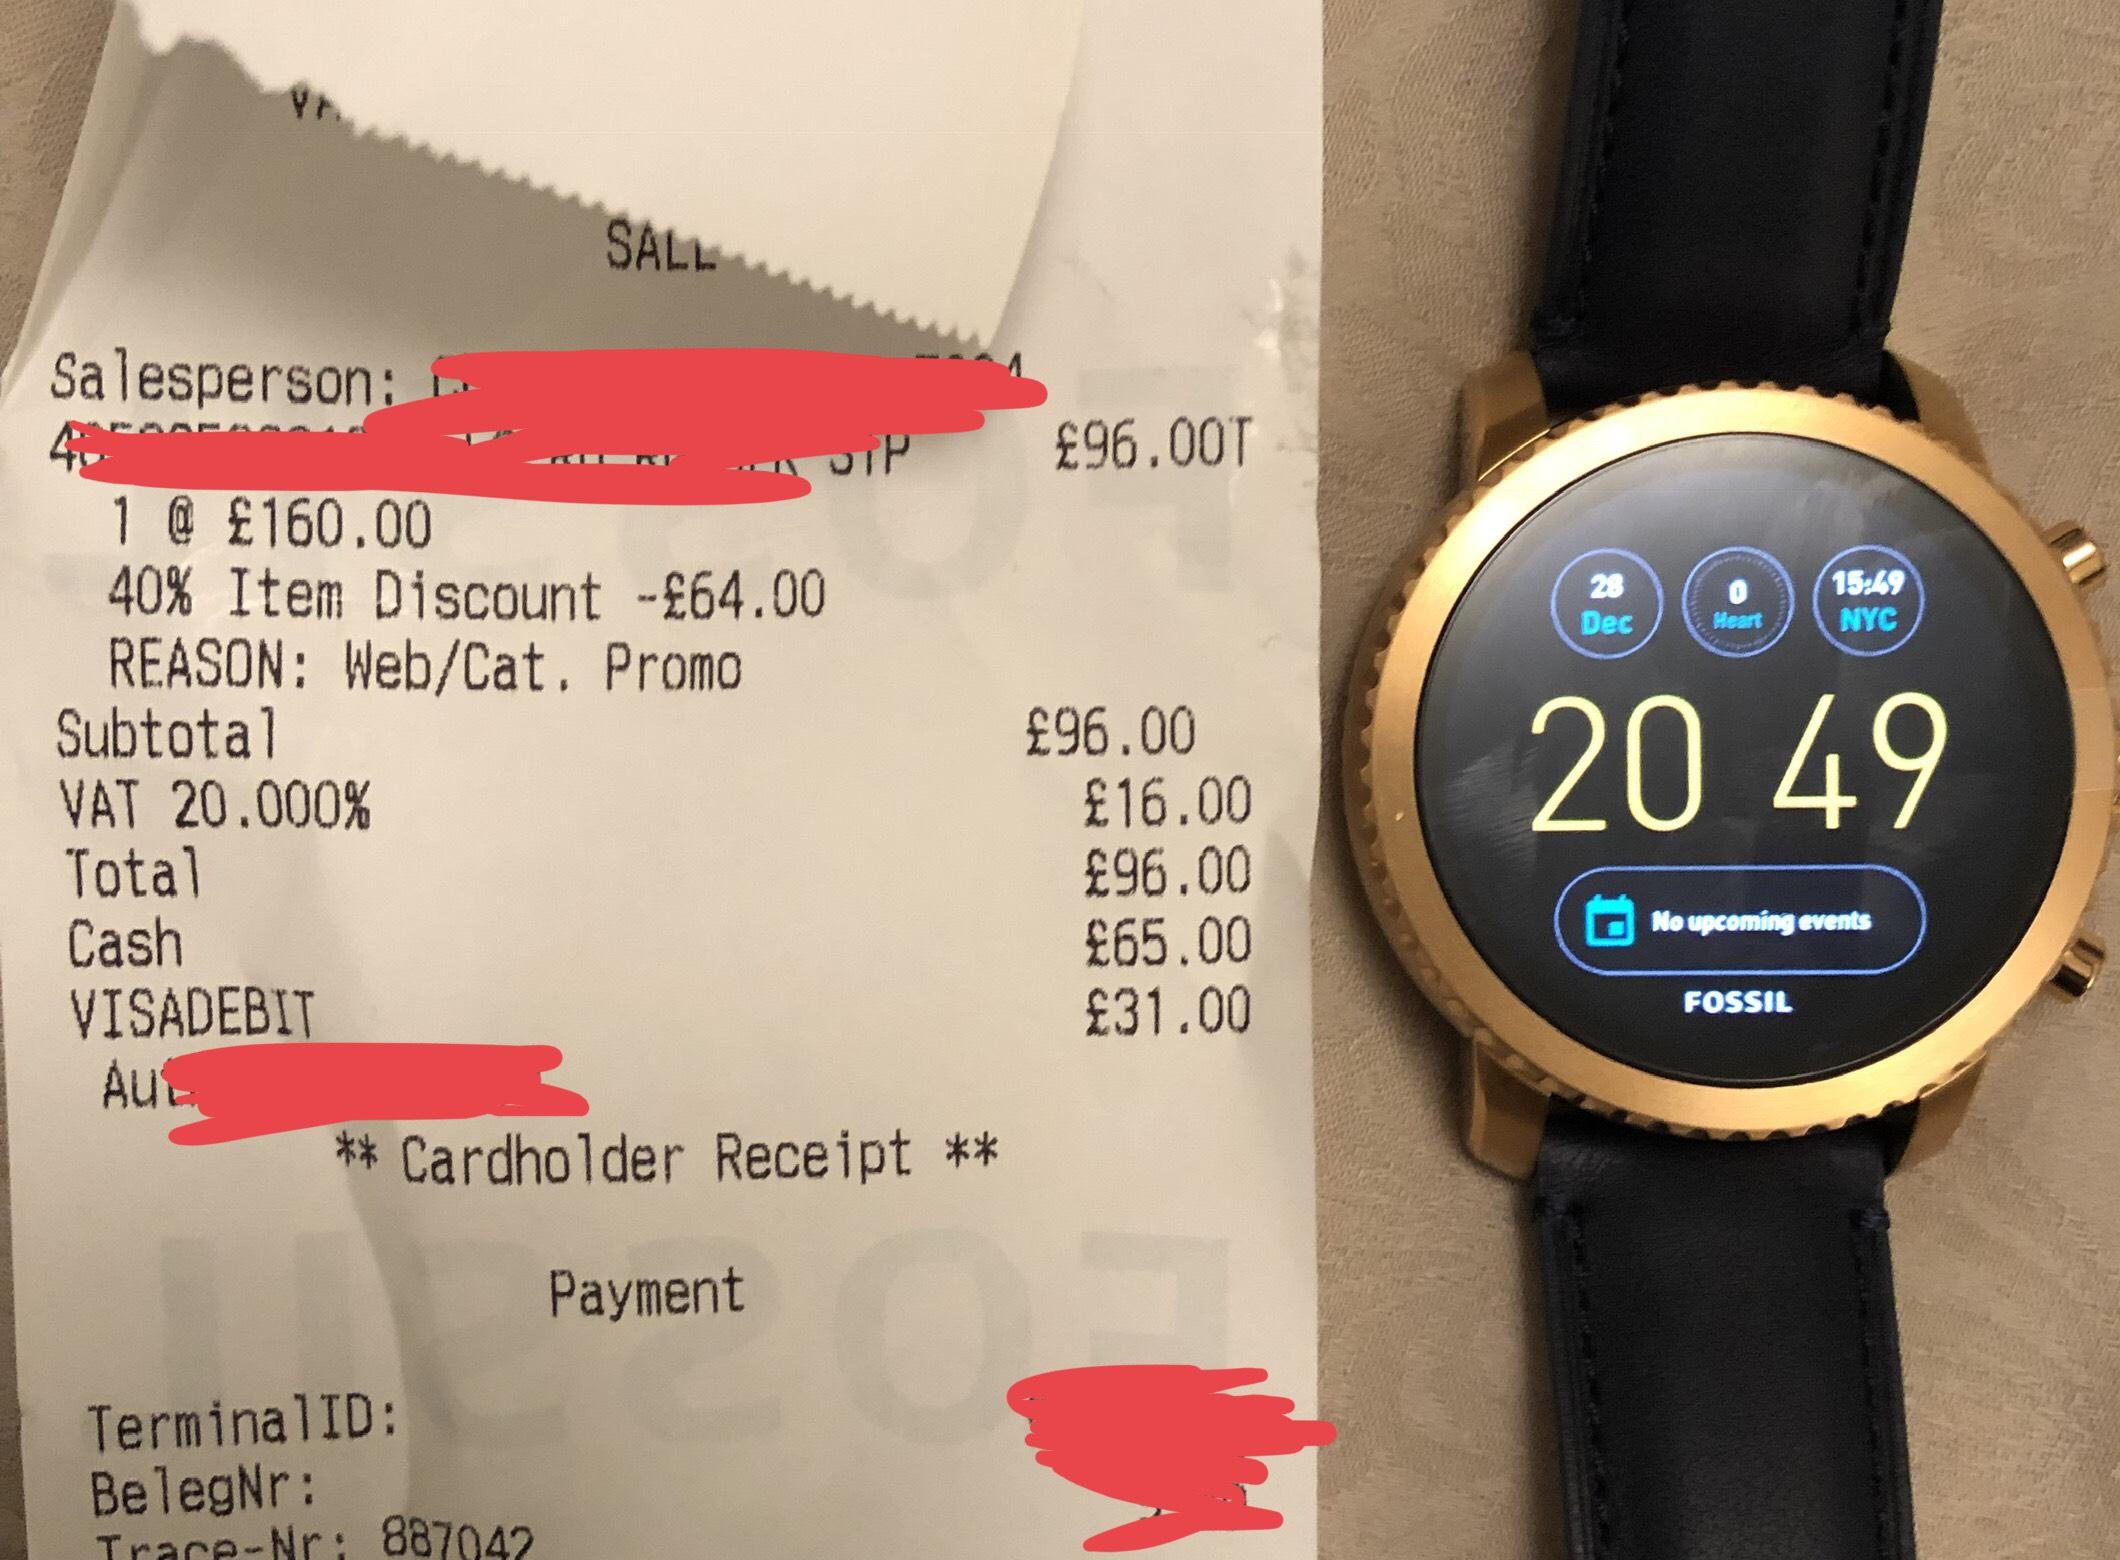 FOSSIL Q Explorist Smartwatch (Gen 3) Navy Leather - £96 instore @ McArthur Glen (Swindon)